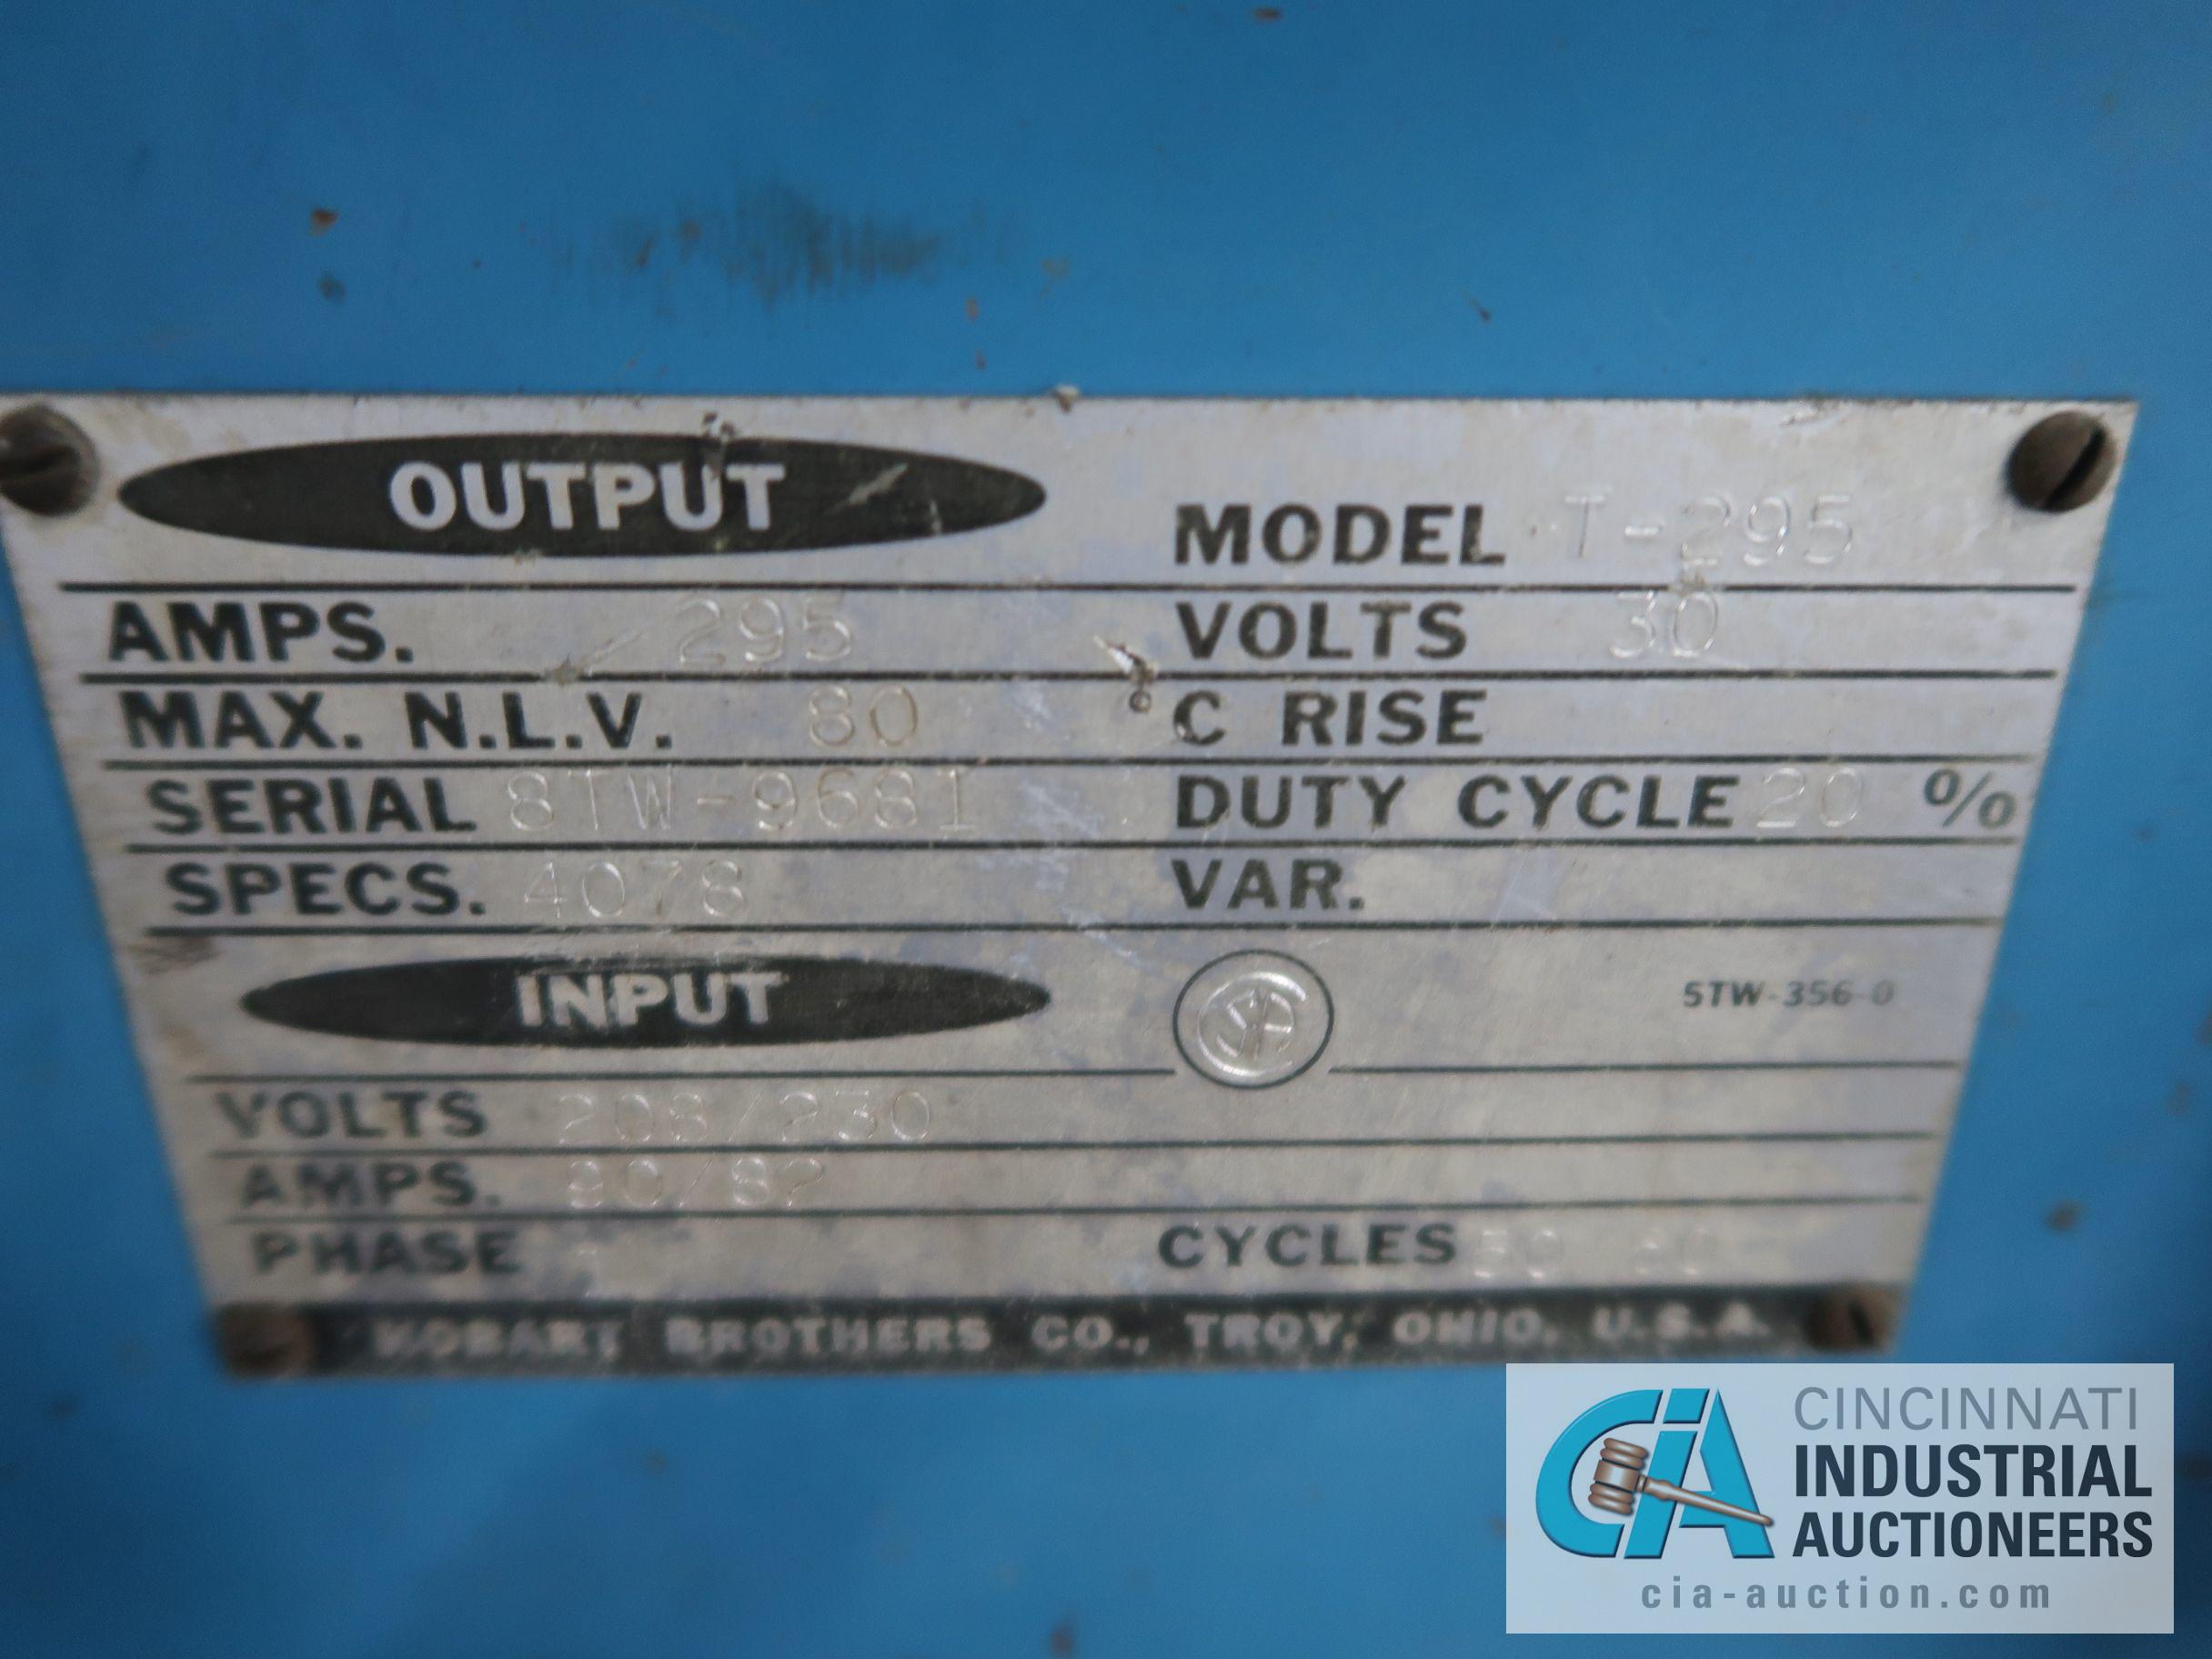 295 AMP HOBART WELDER - Image 2 of 2